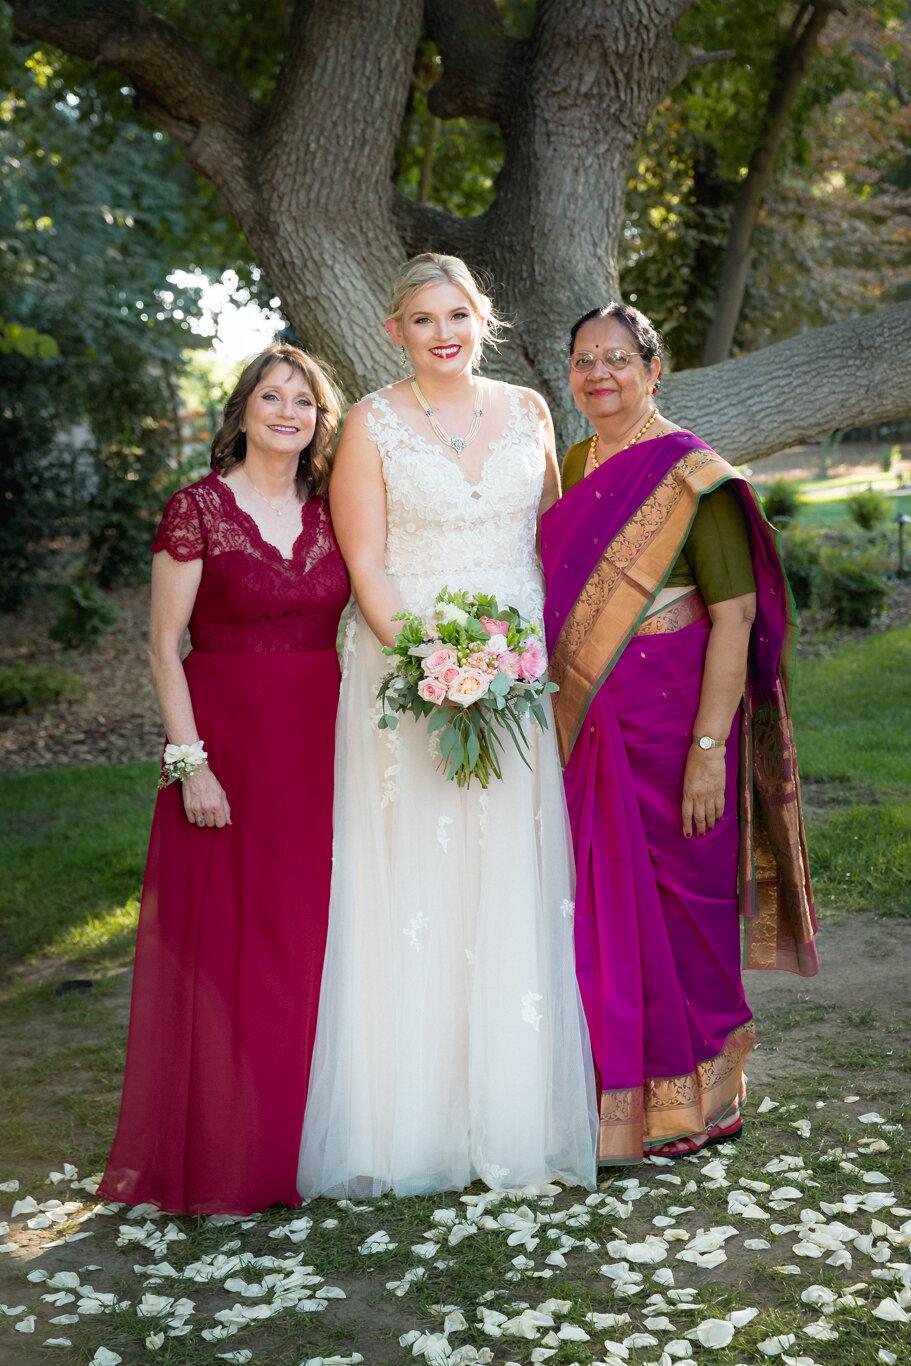 2019.08.24_Emily-Ashir-Wedding-at-the-Maples-6029.jpg